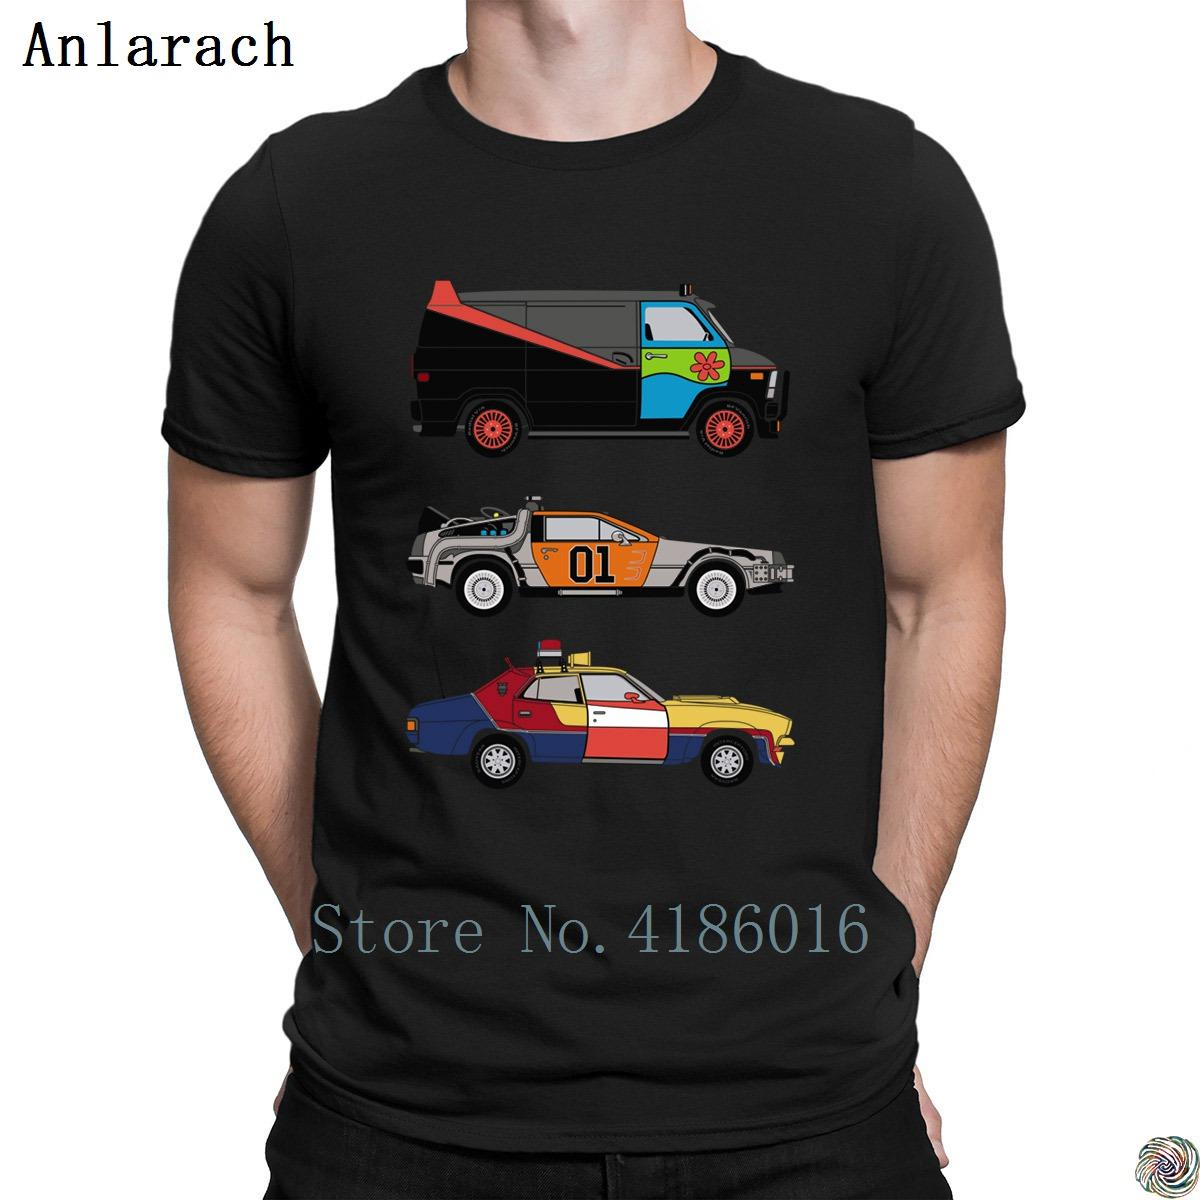 9a90a70aa362 Body Shop T Shirt Designs